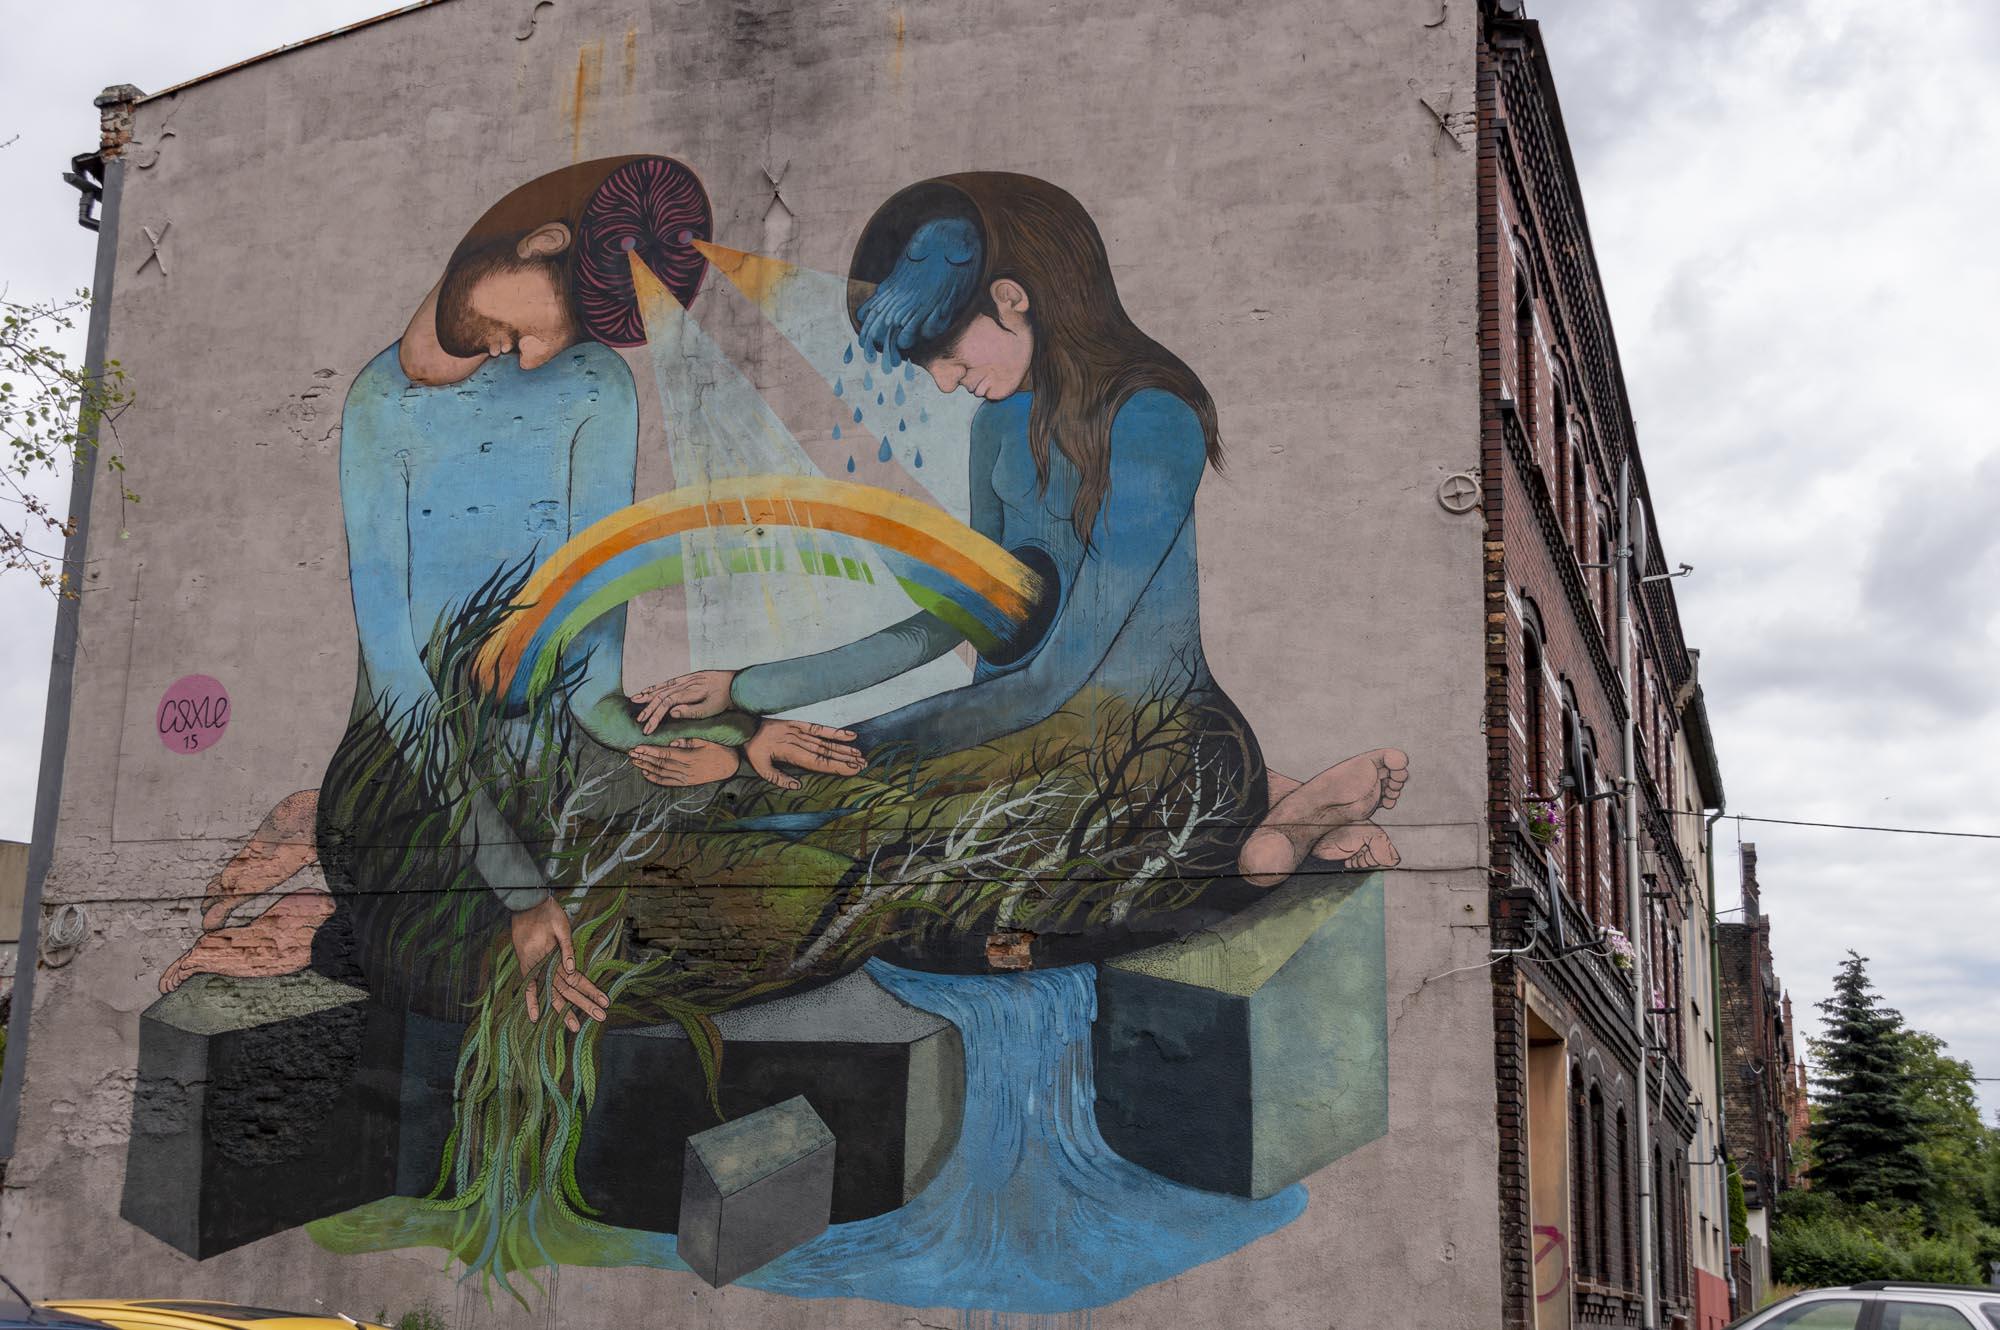 things to do in Katowice - street art